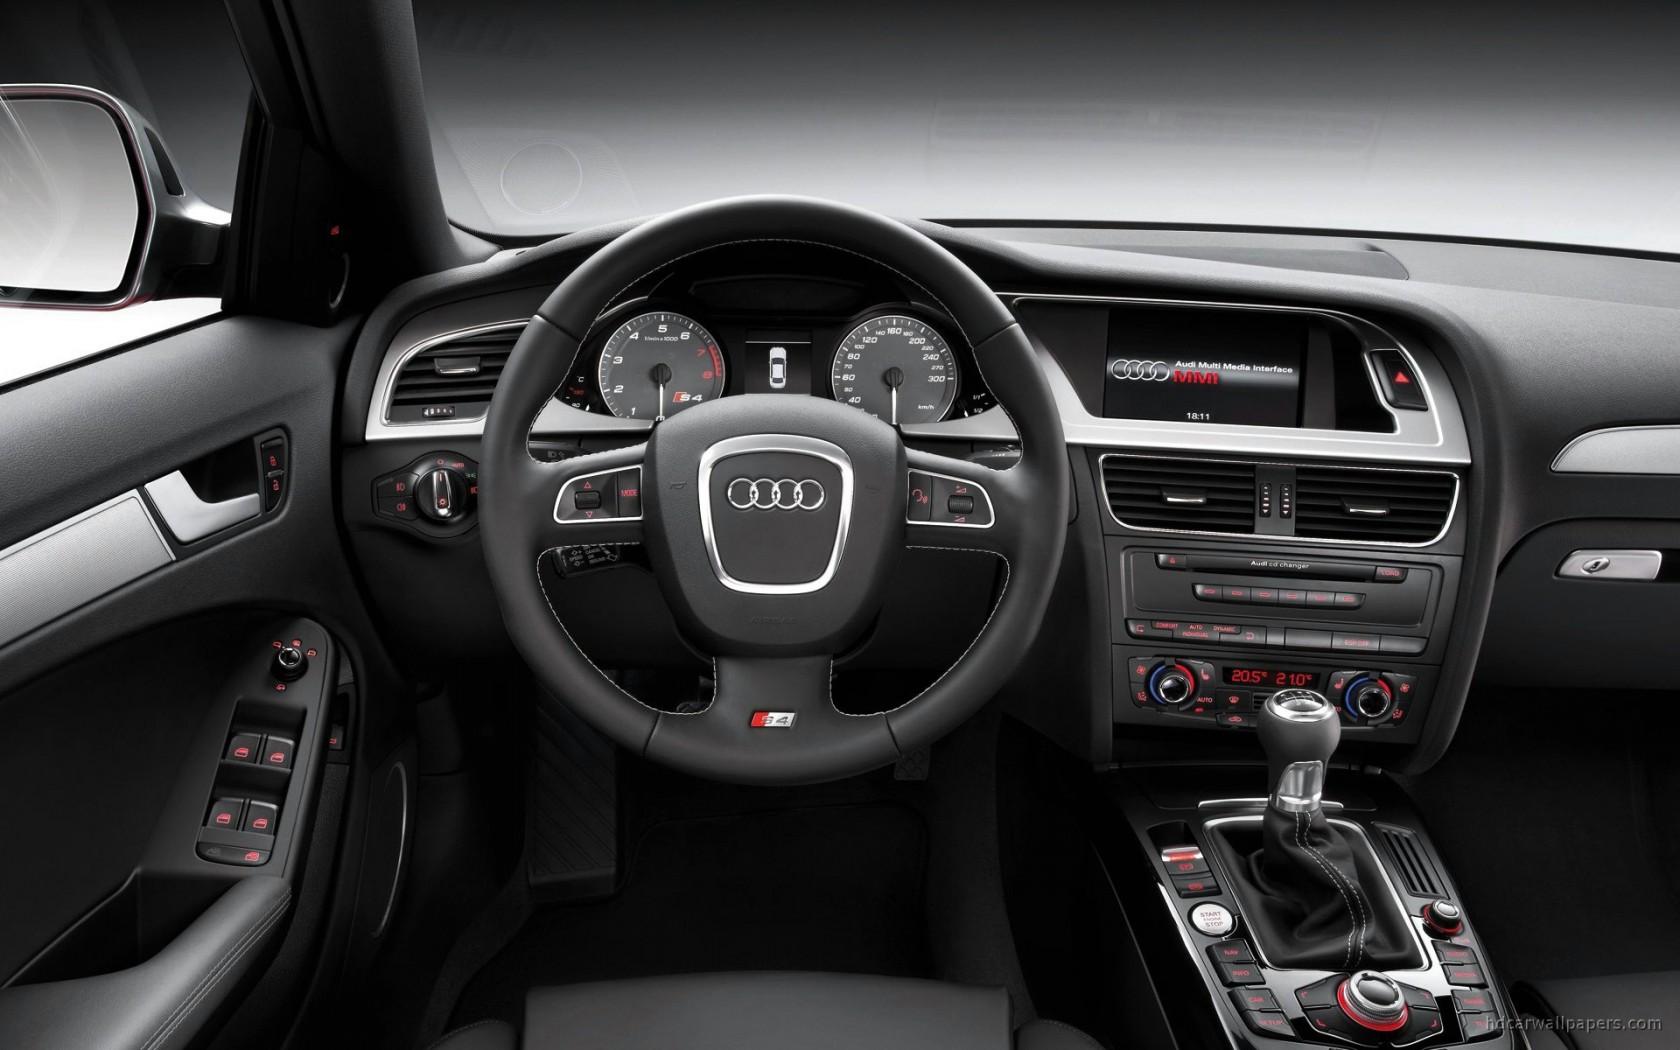 2009 Audi S4 Interior Wallpaper Hd Car Wallpapers Id 78